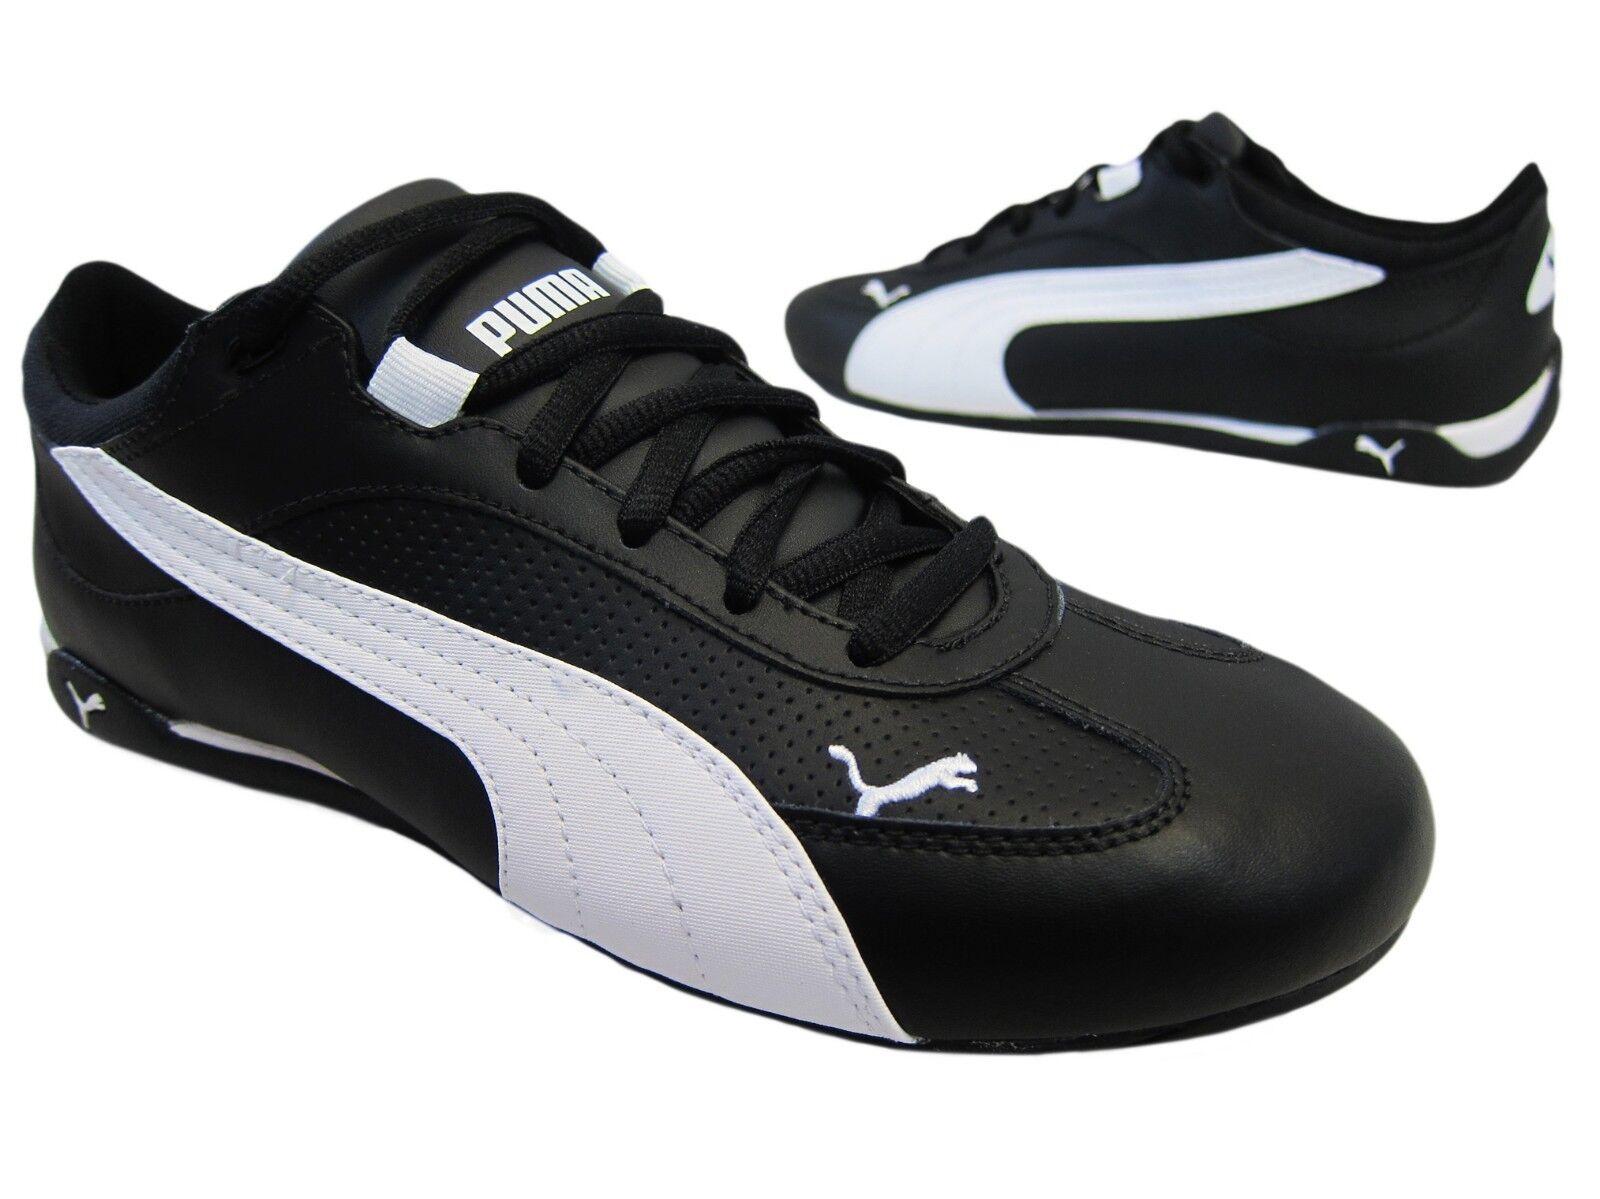 Puma Men's K-Street II 2 Running Shoes size 10 - Brand New